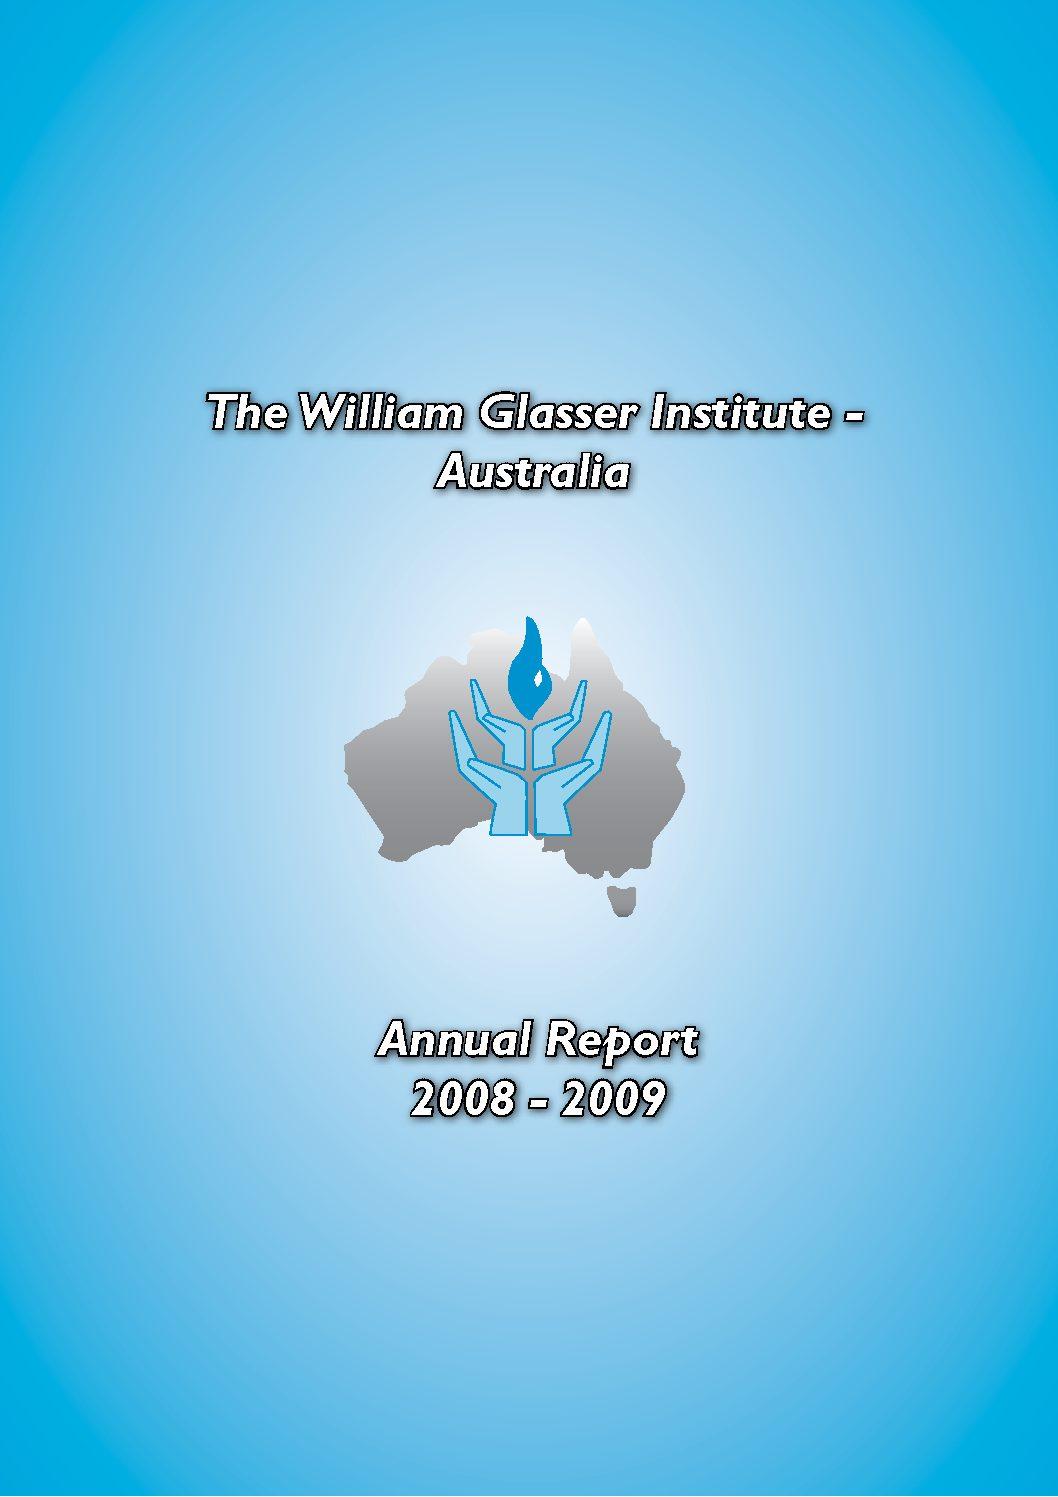 2009 Annual Report 0809